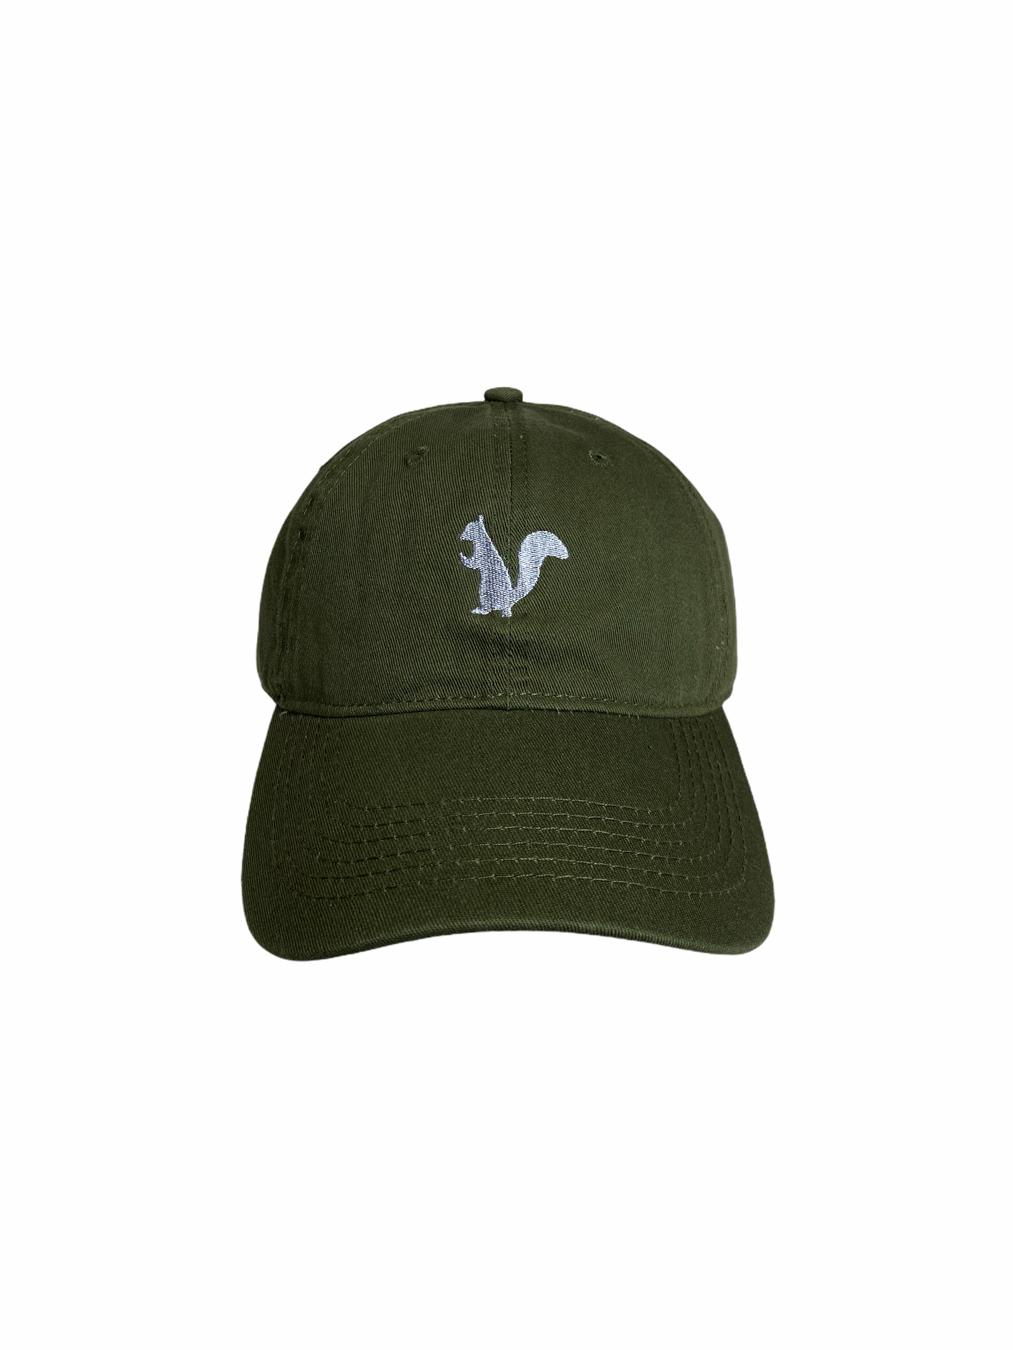 Kidnapme Cap (Olive)